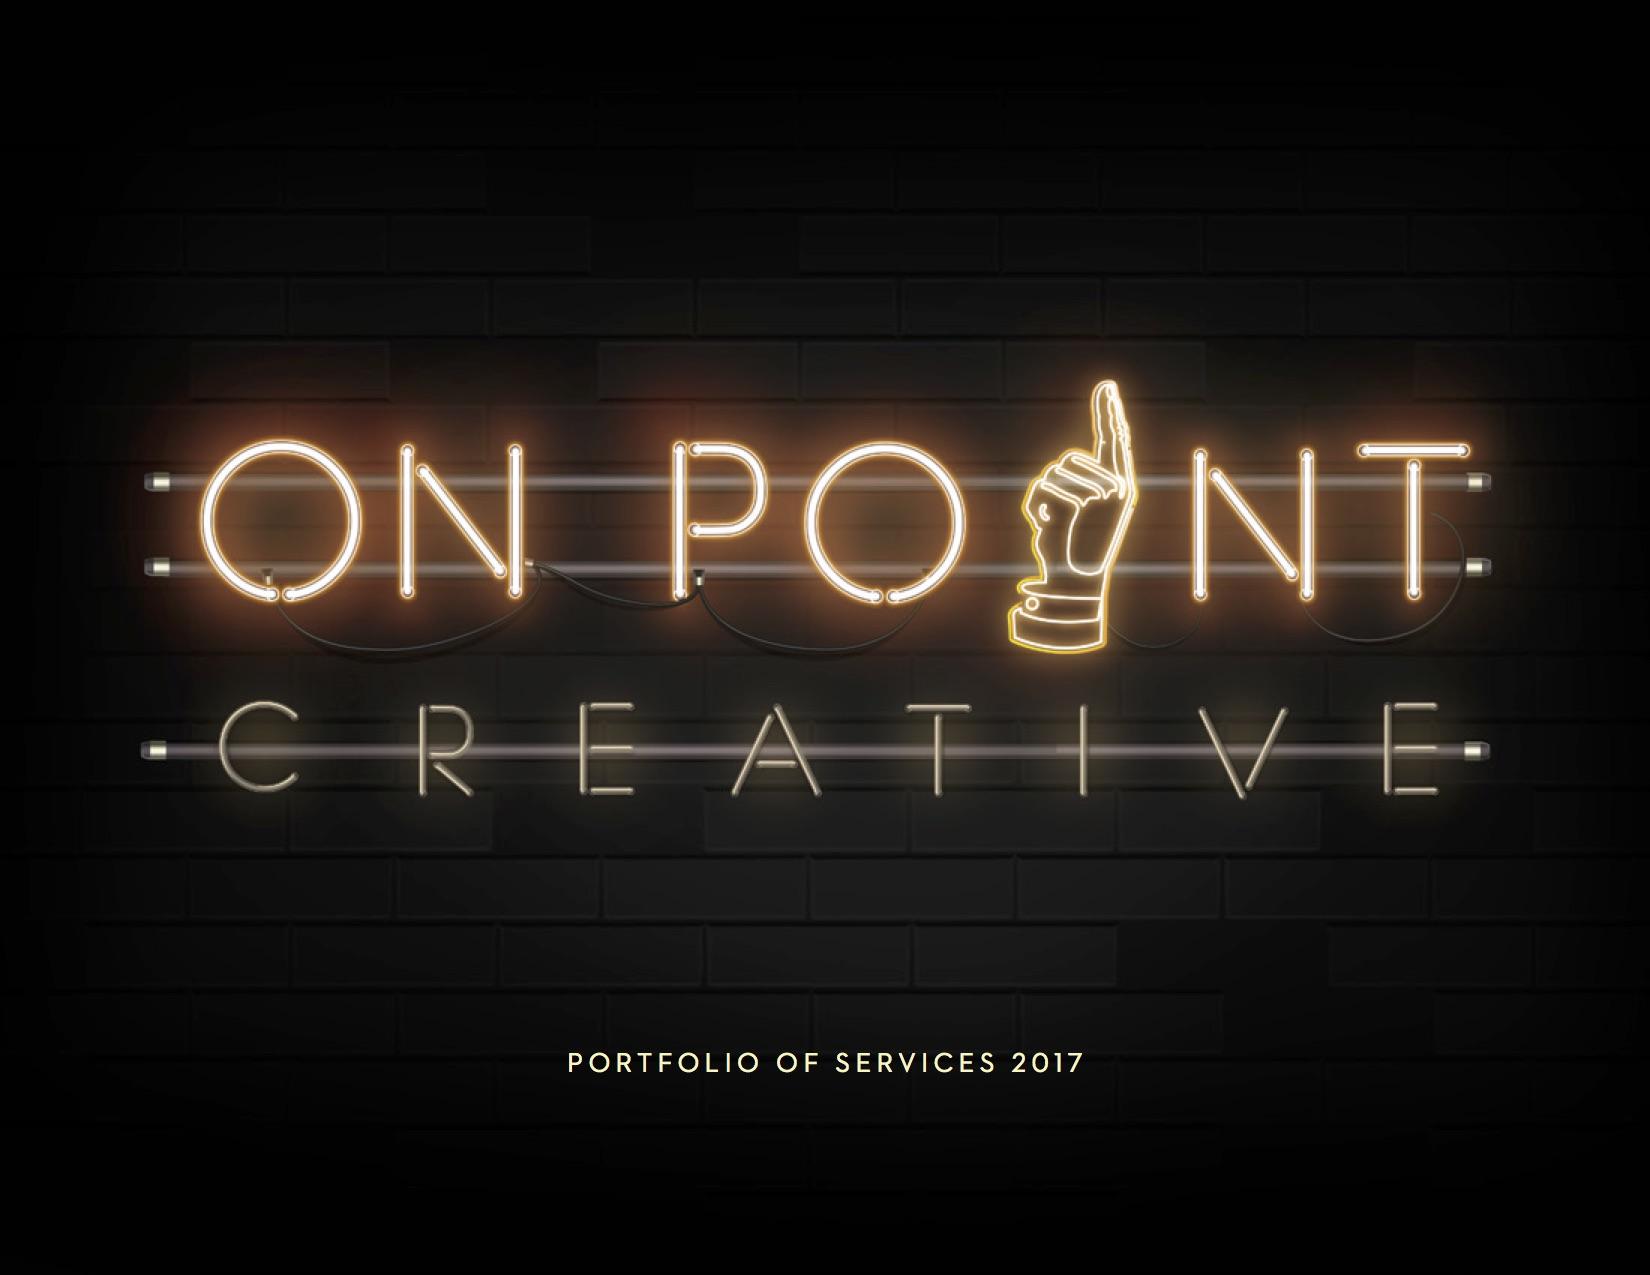 On Point Creative